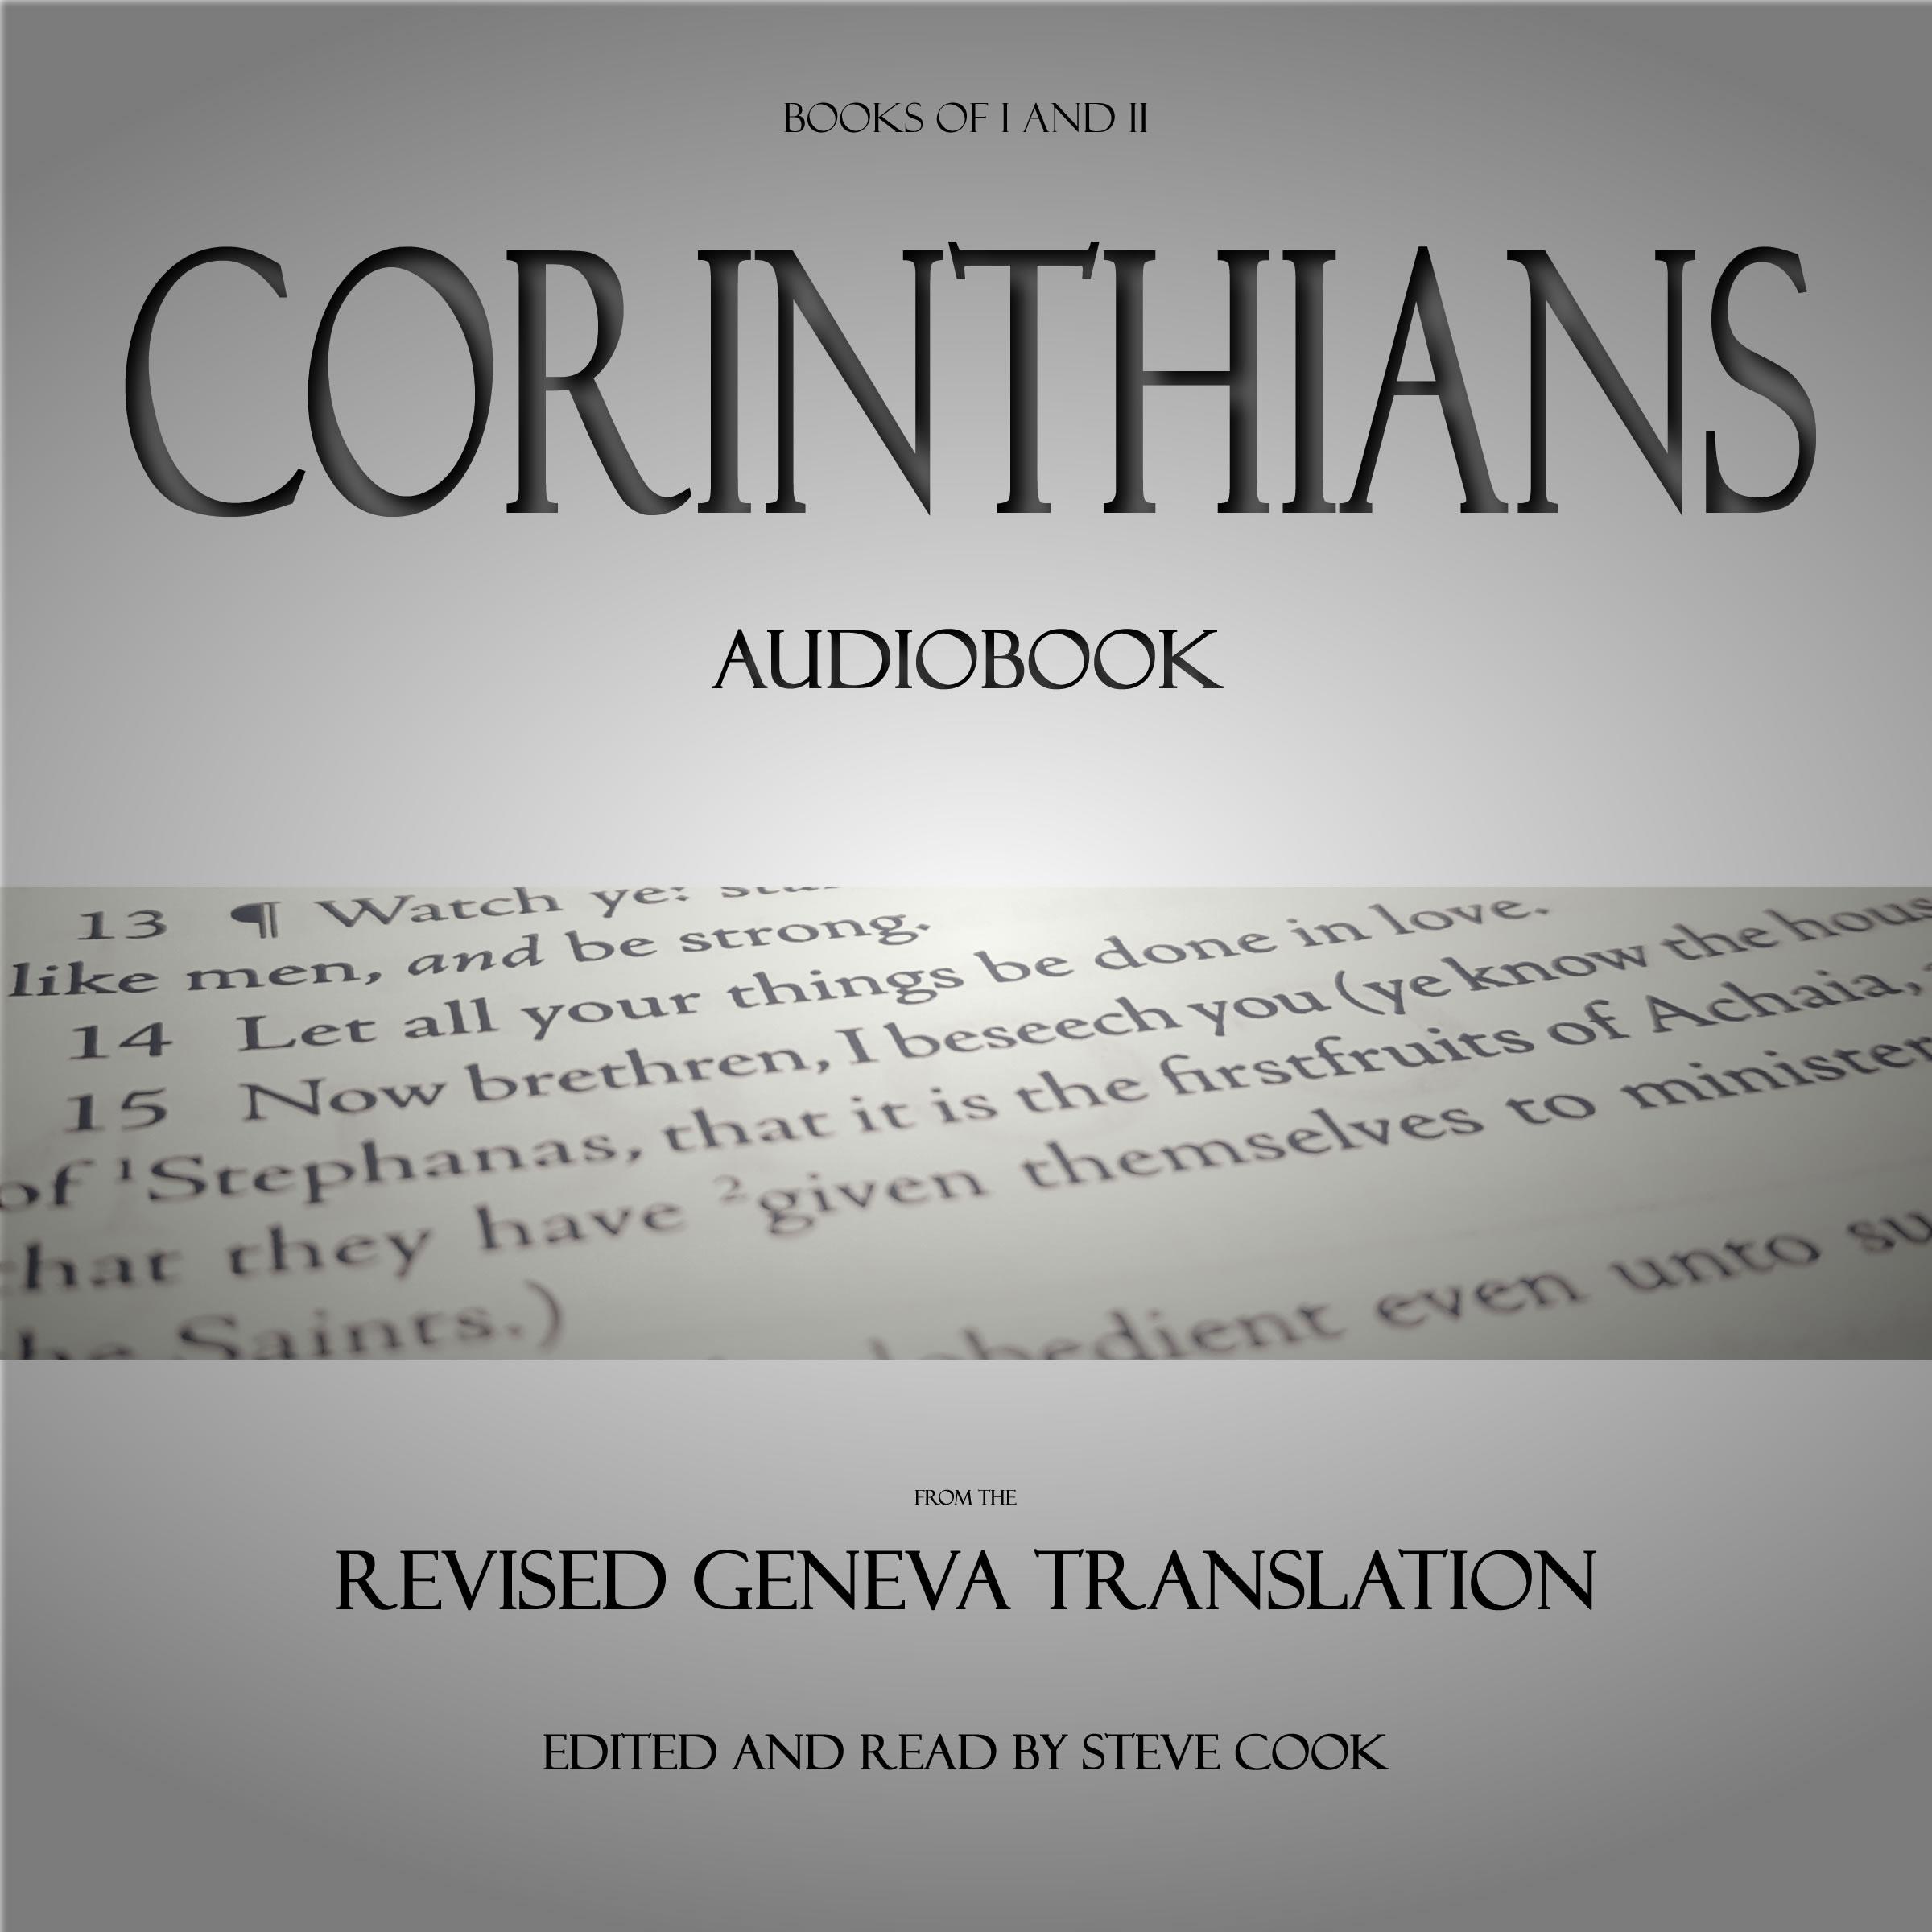 RGT_Corinthians_COVER2_mix.jpg